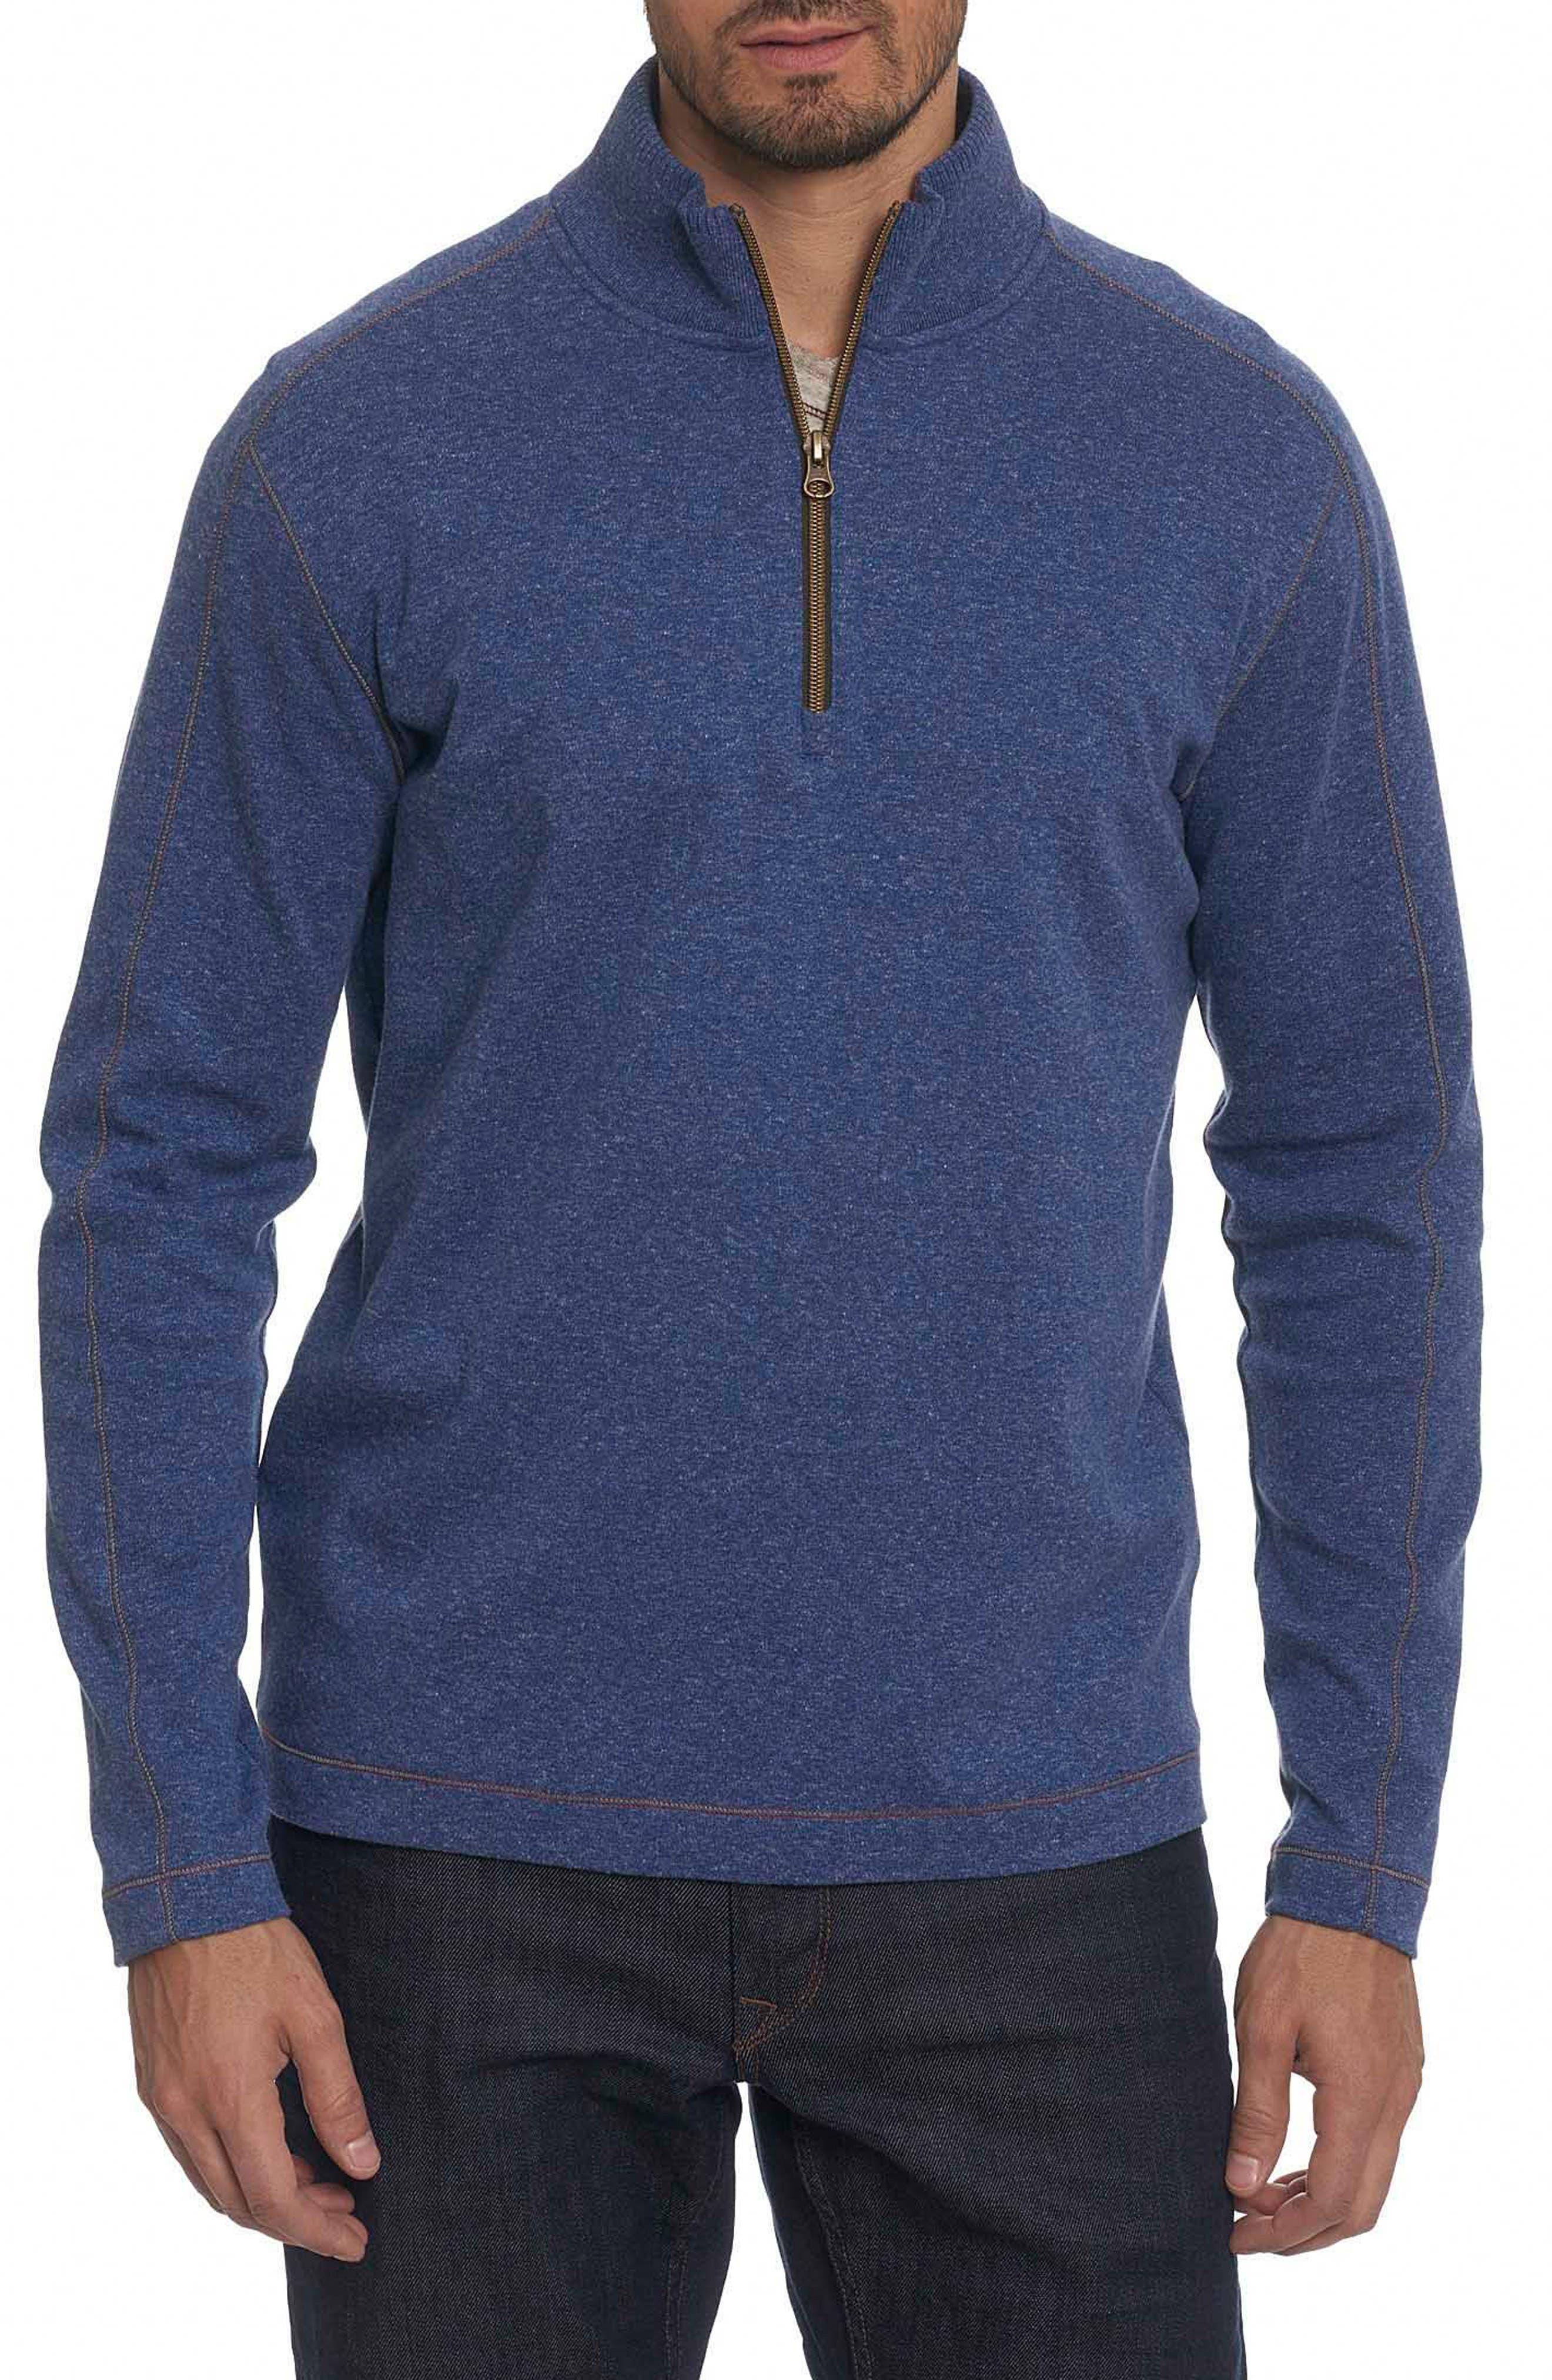 Robert Graham 'Elia' Regular Fit Quarter Zip Pullover